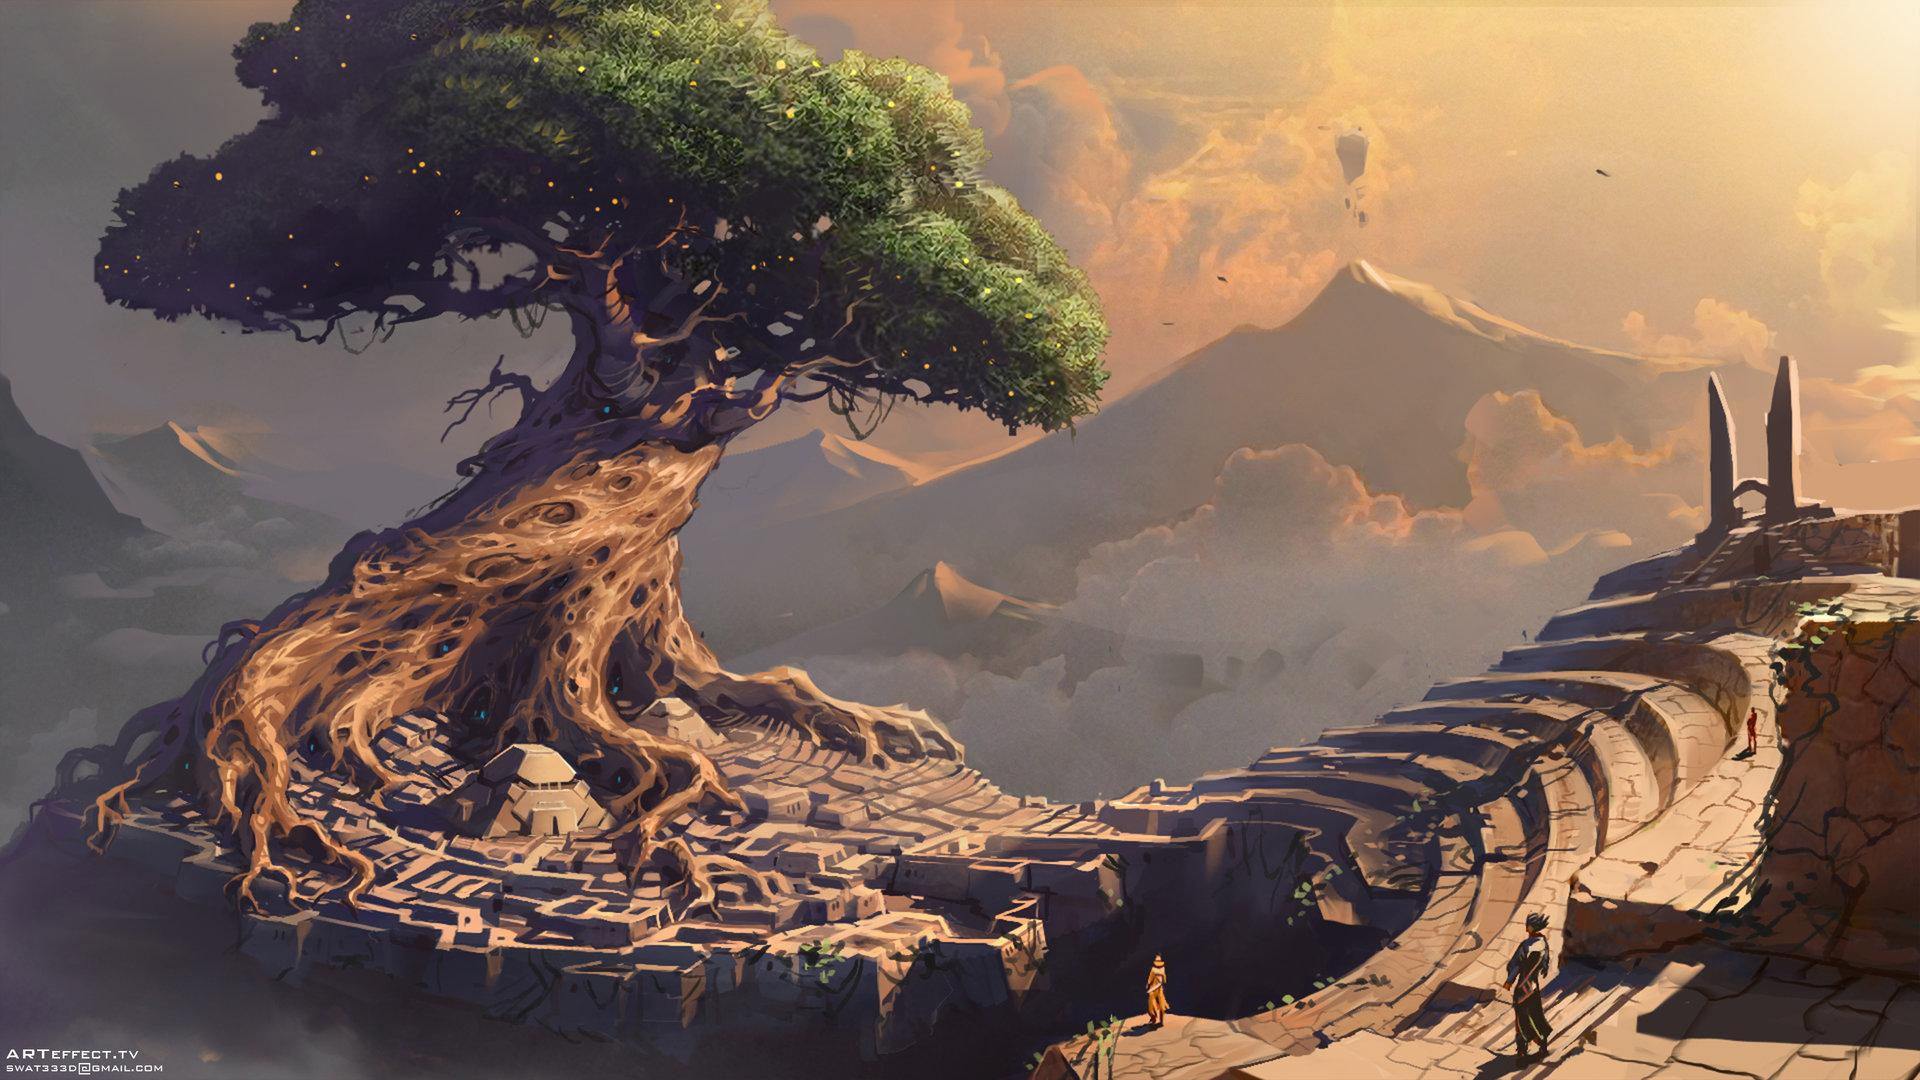 Sviatoslav gerasimchuk ancient supertree